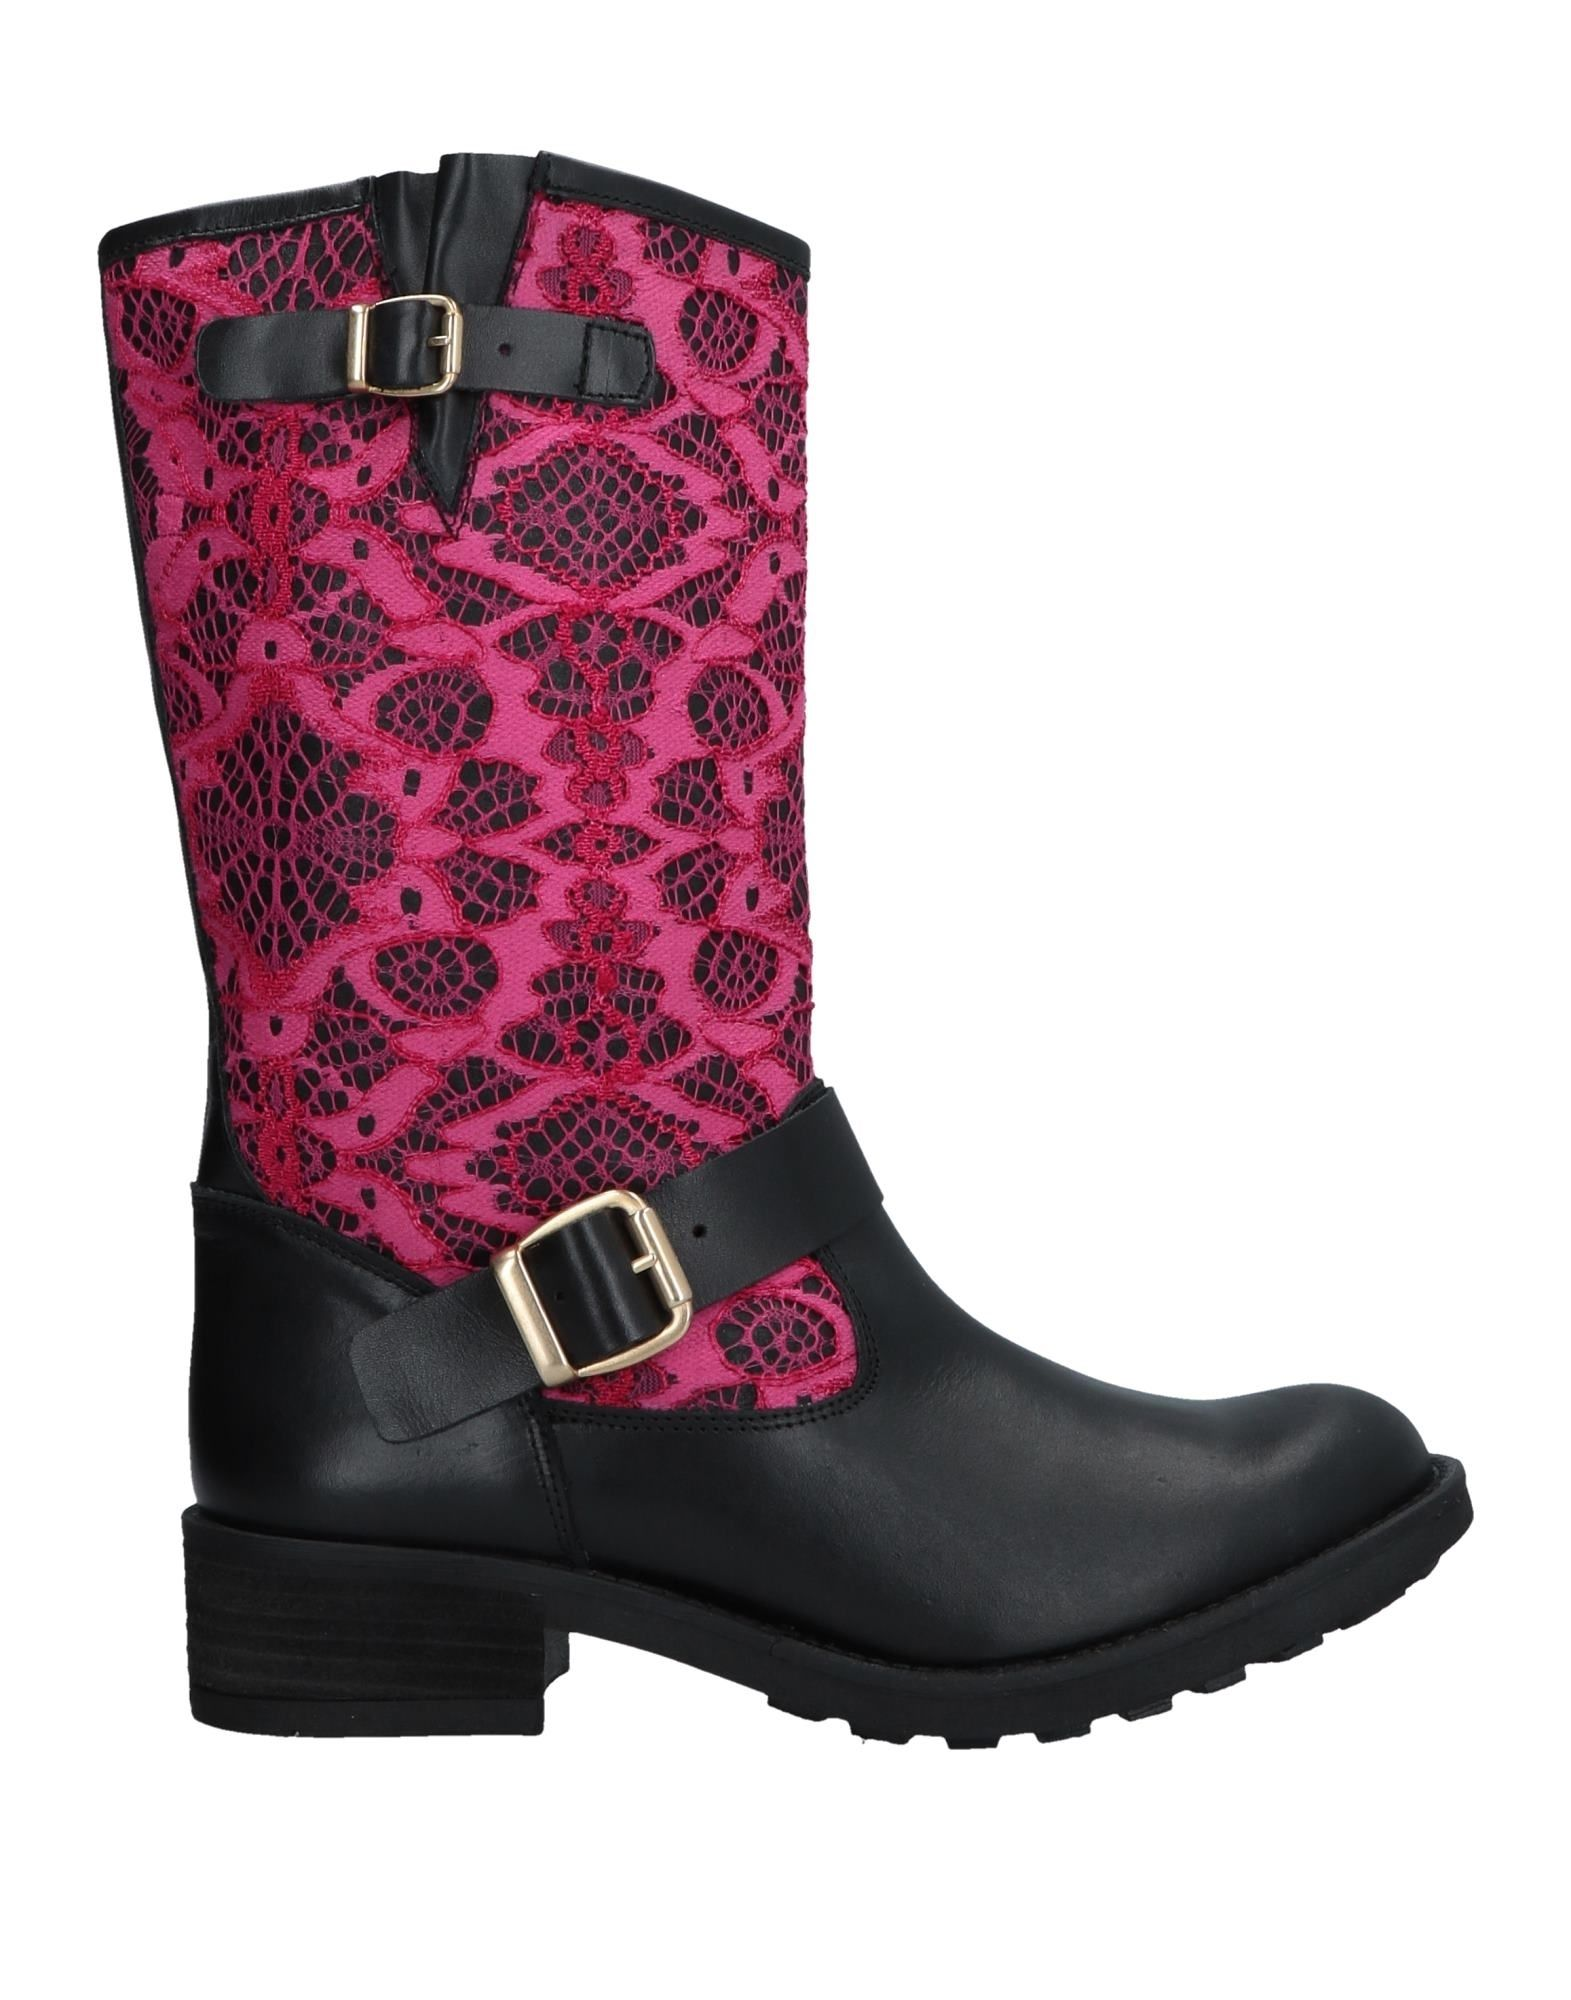 Pianurastudio Boots  - Women Pianurastudio Boots online on  Boots Australia - 11567392FS eb1c4c